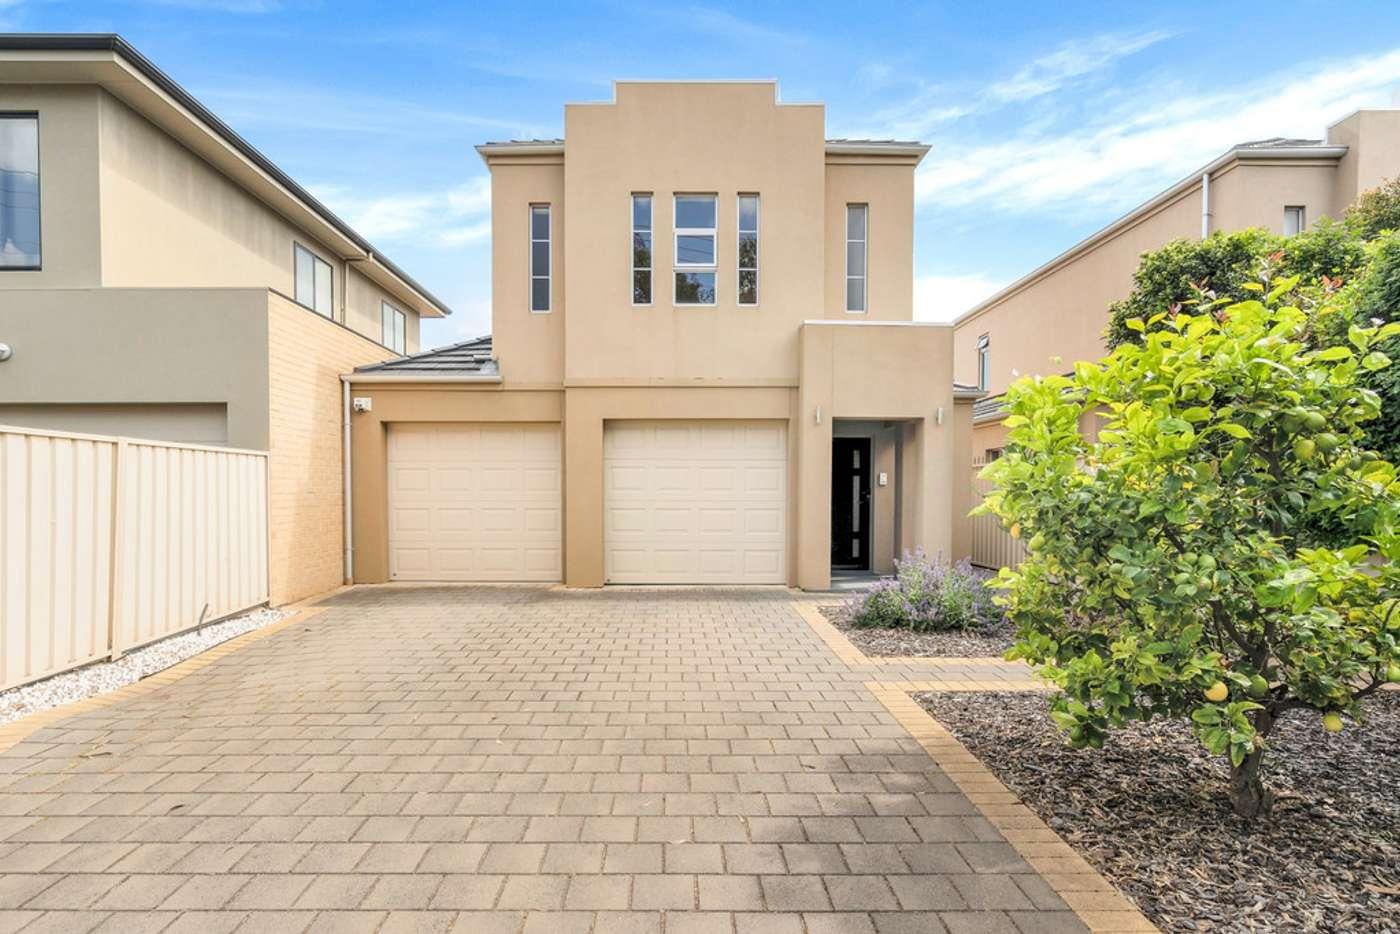 Main view of Homely house listing, 624a Burbridge Road, West Beach SA 5024